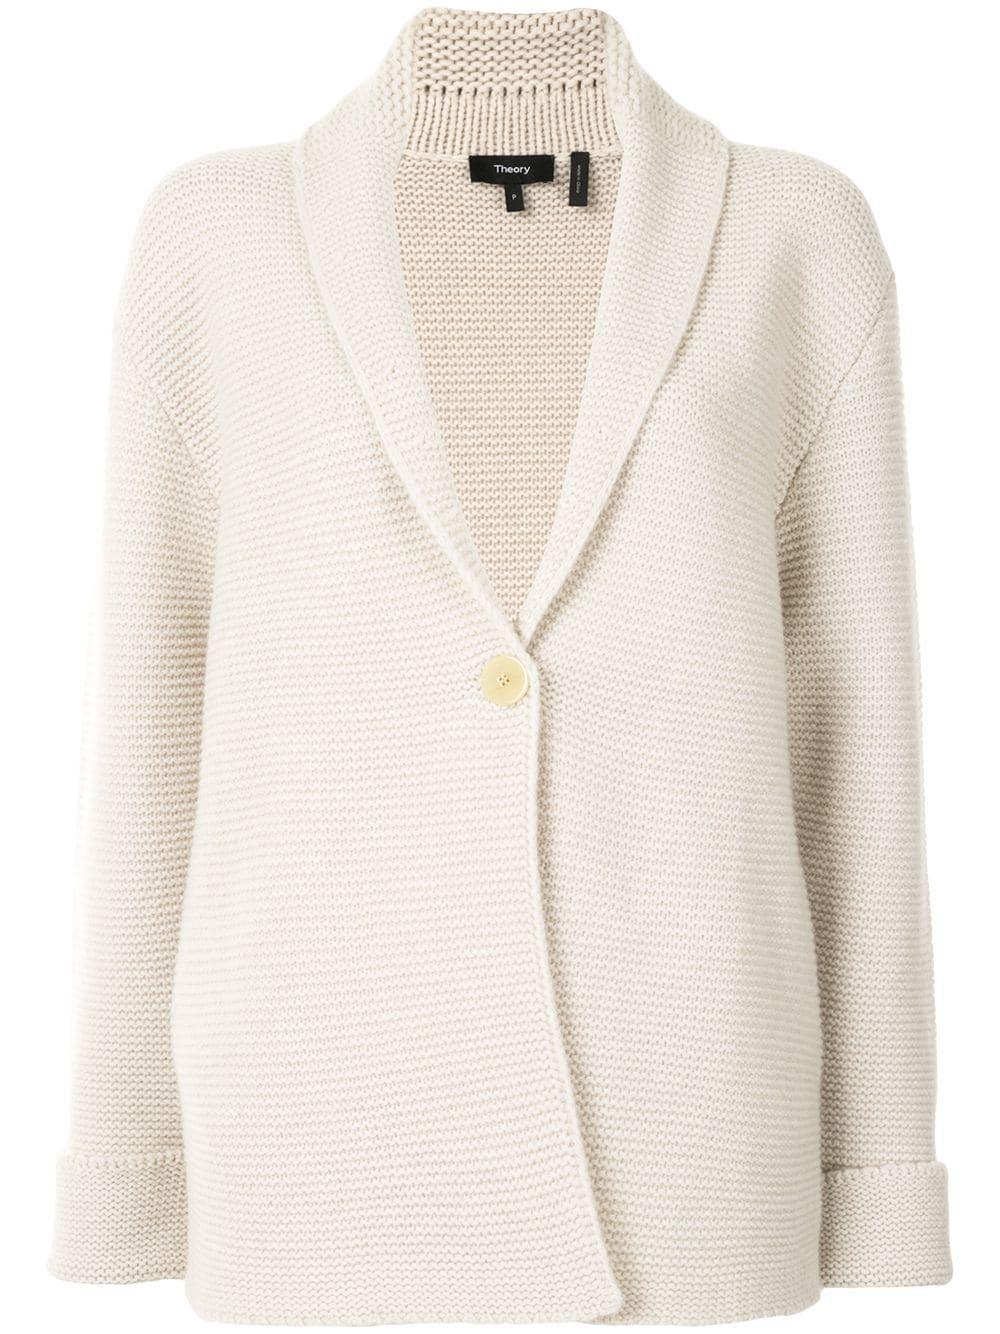 Links Oversized Sweater Coat Item # K0811722